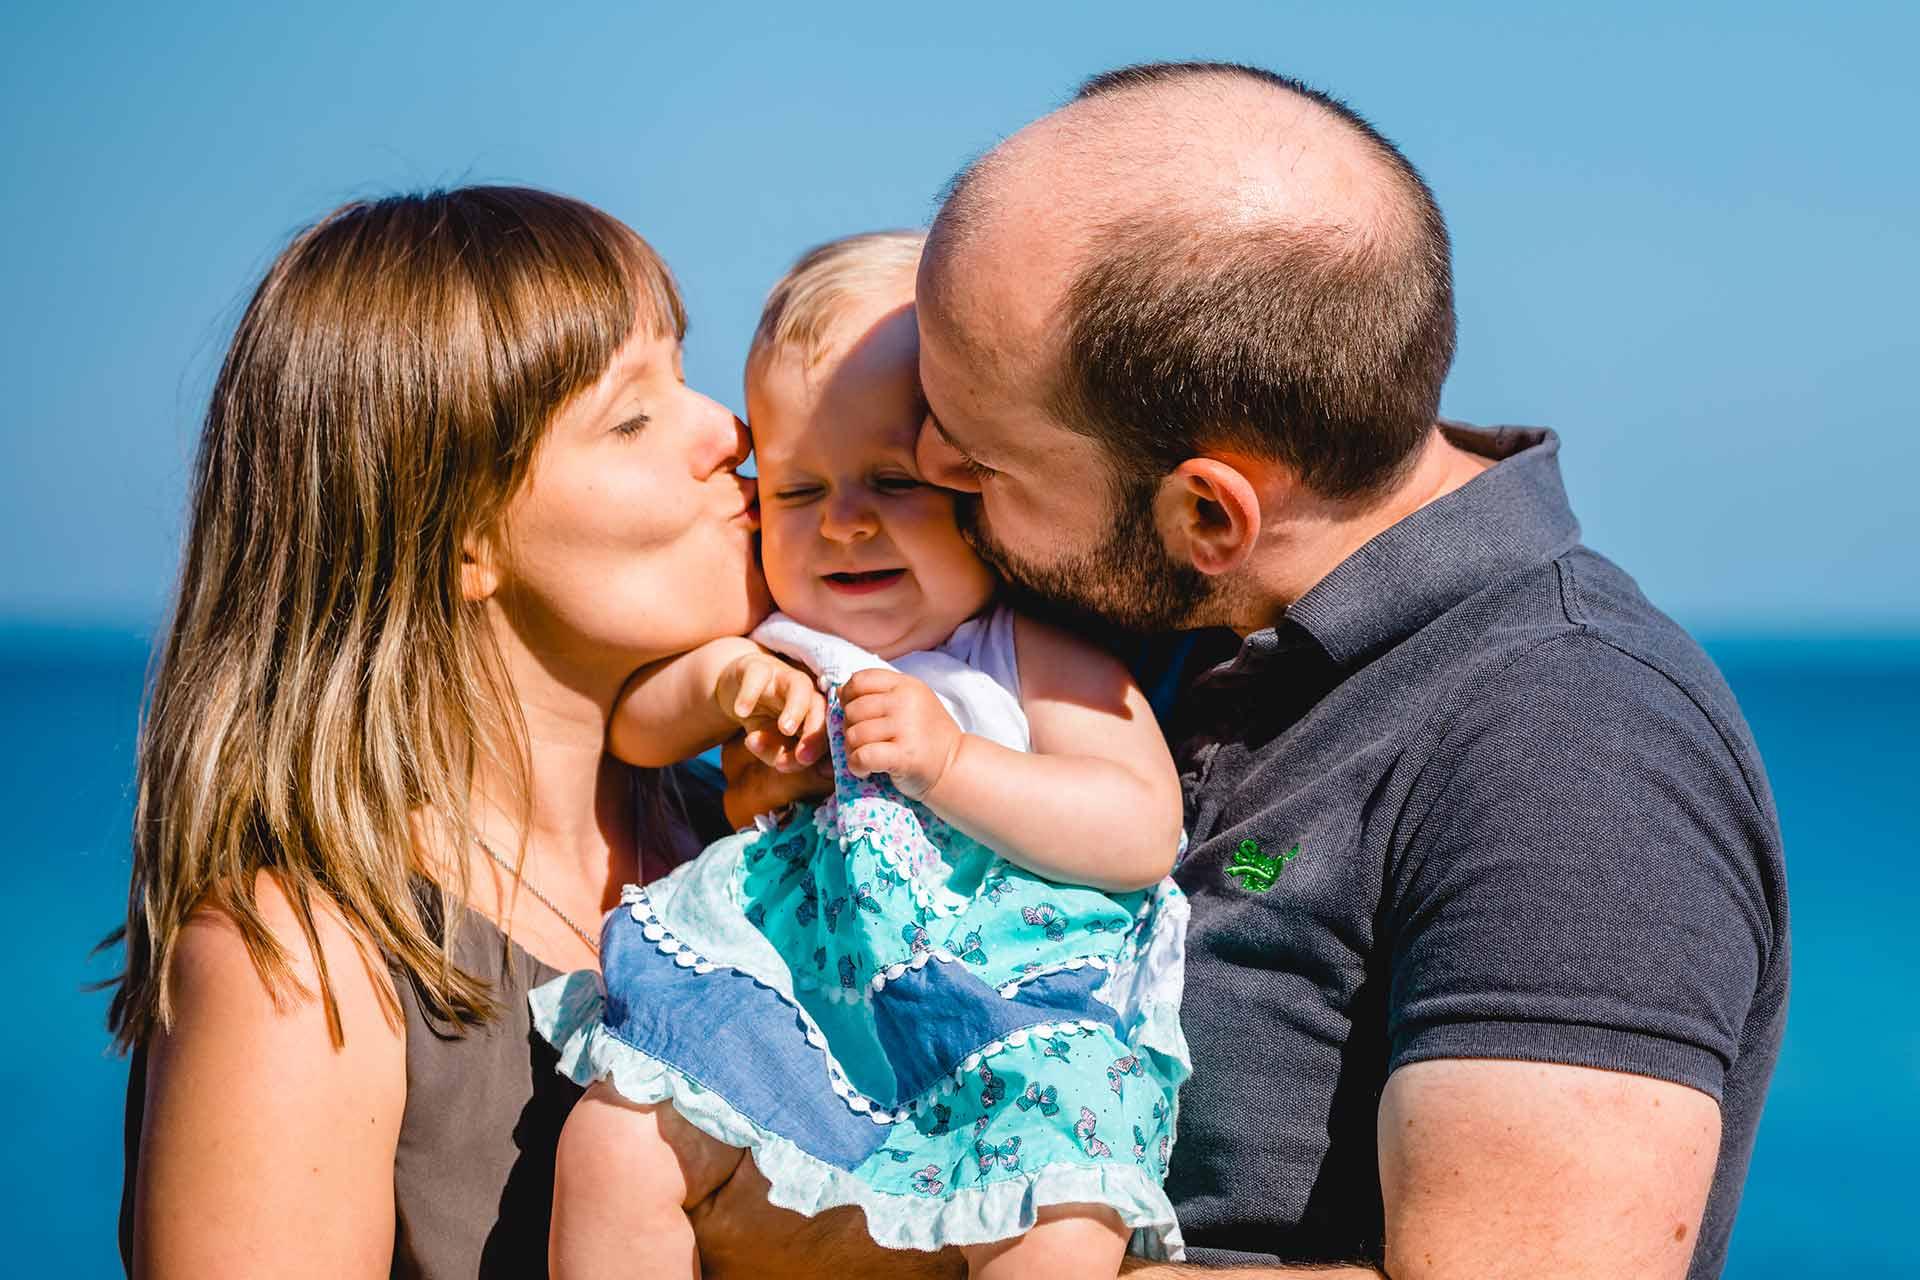 Mama-und-Papa-kuessen-Baby-gleichzeitig-auf-Wange-Shooting-am-Strand-Familienfotografie-Fotograf-Rostock - Familienshooting